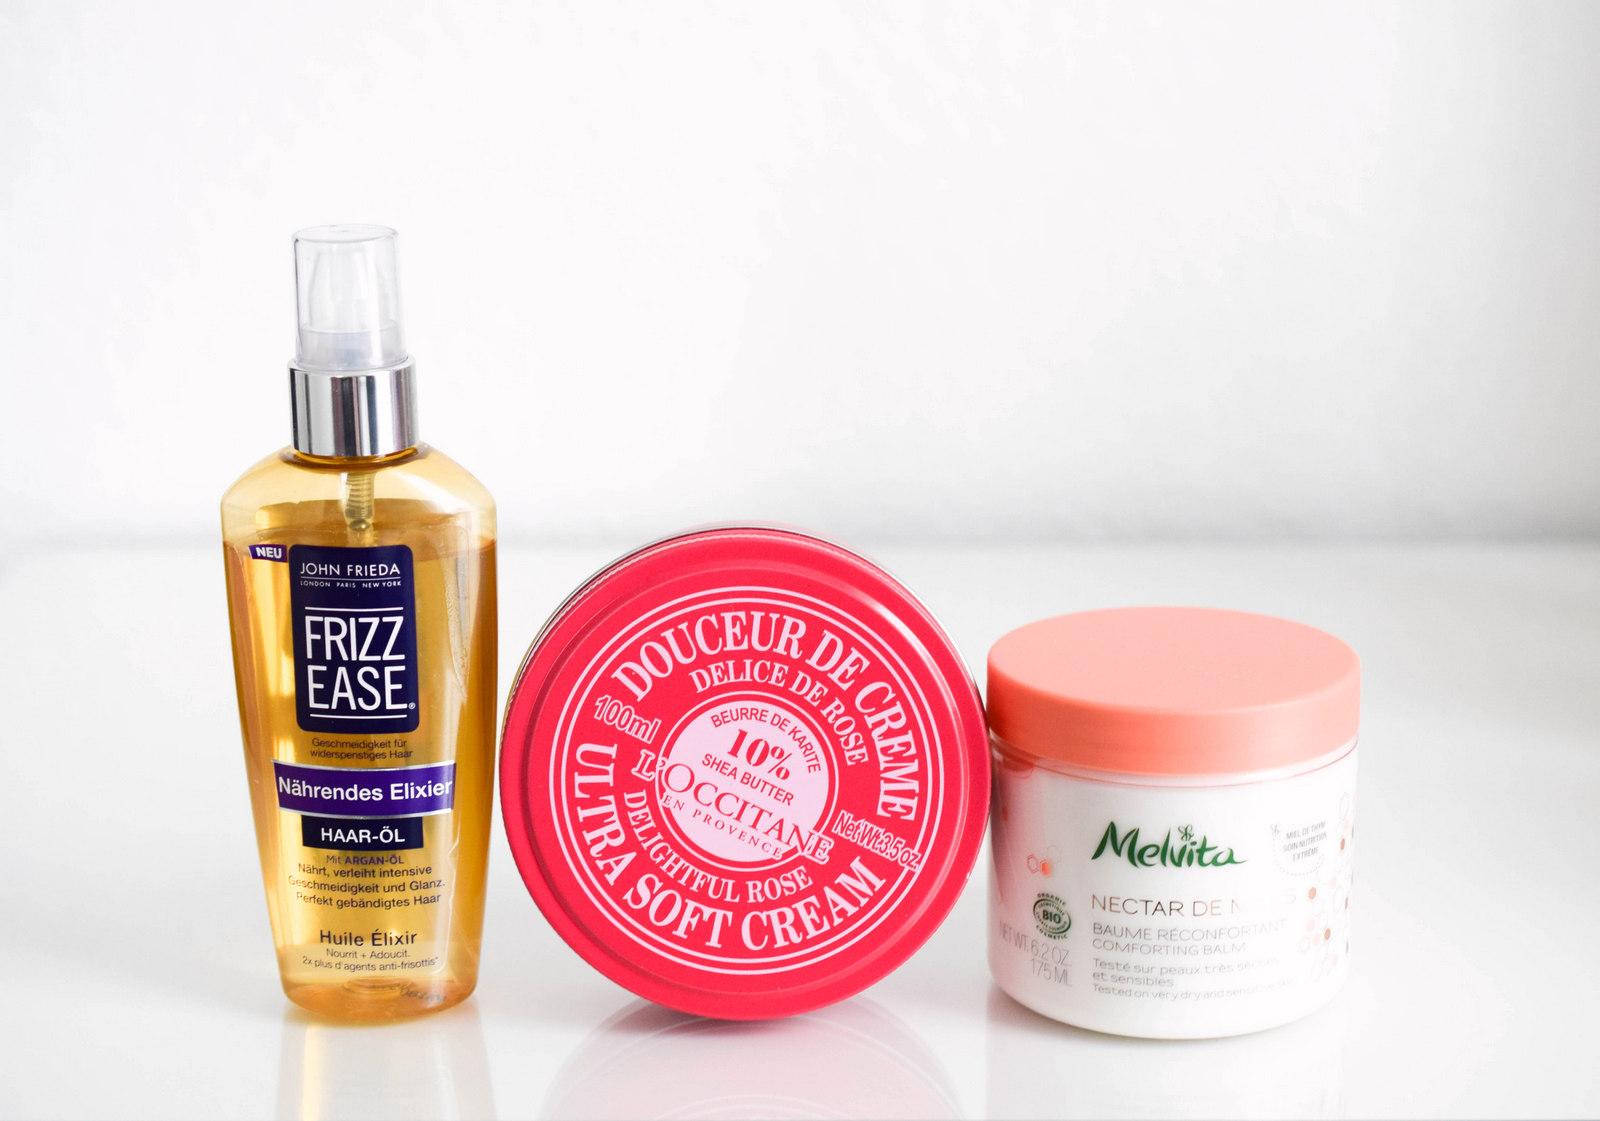 Beauty Blog Favoriten Kosmetik aus dem Monat Februar mit John Frieda, L'Occitane und Melivta